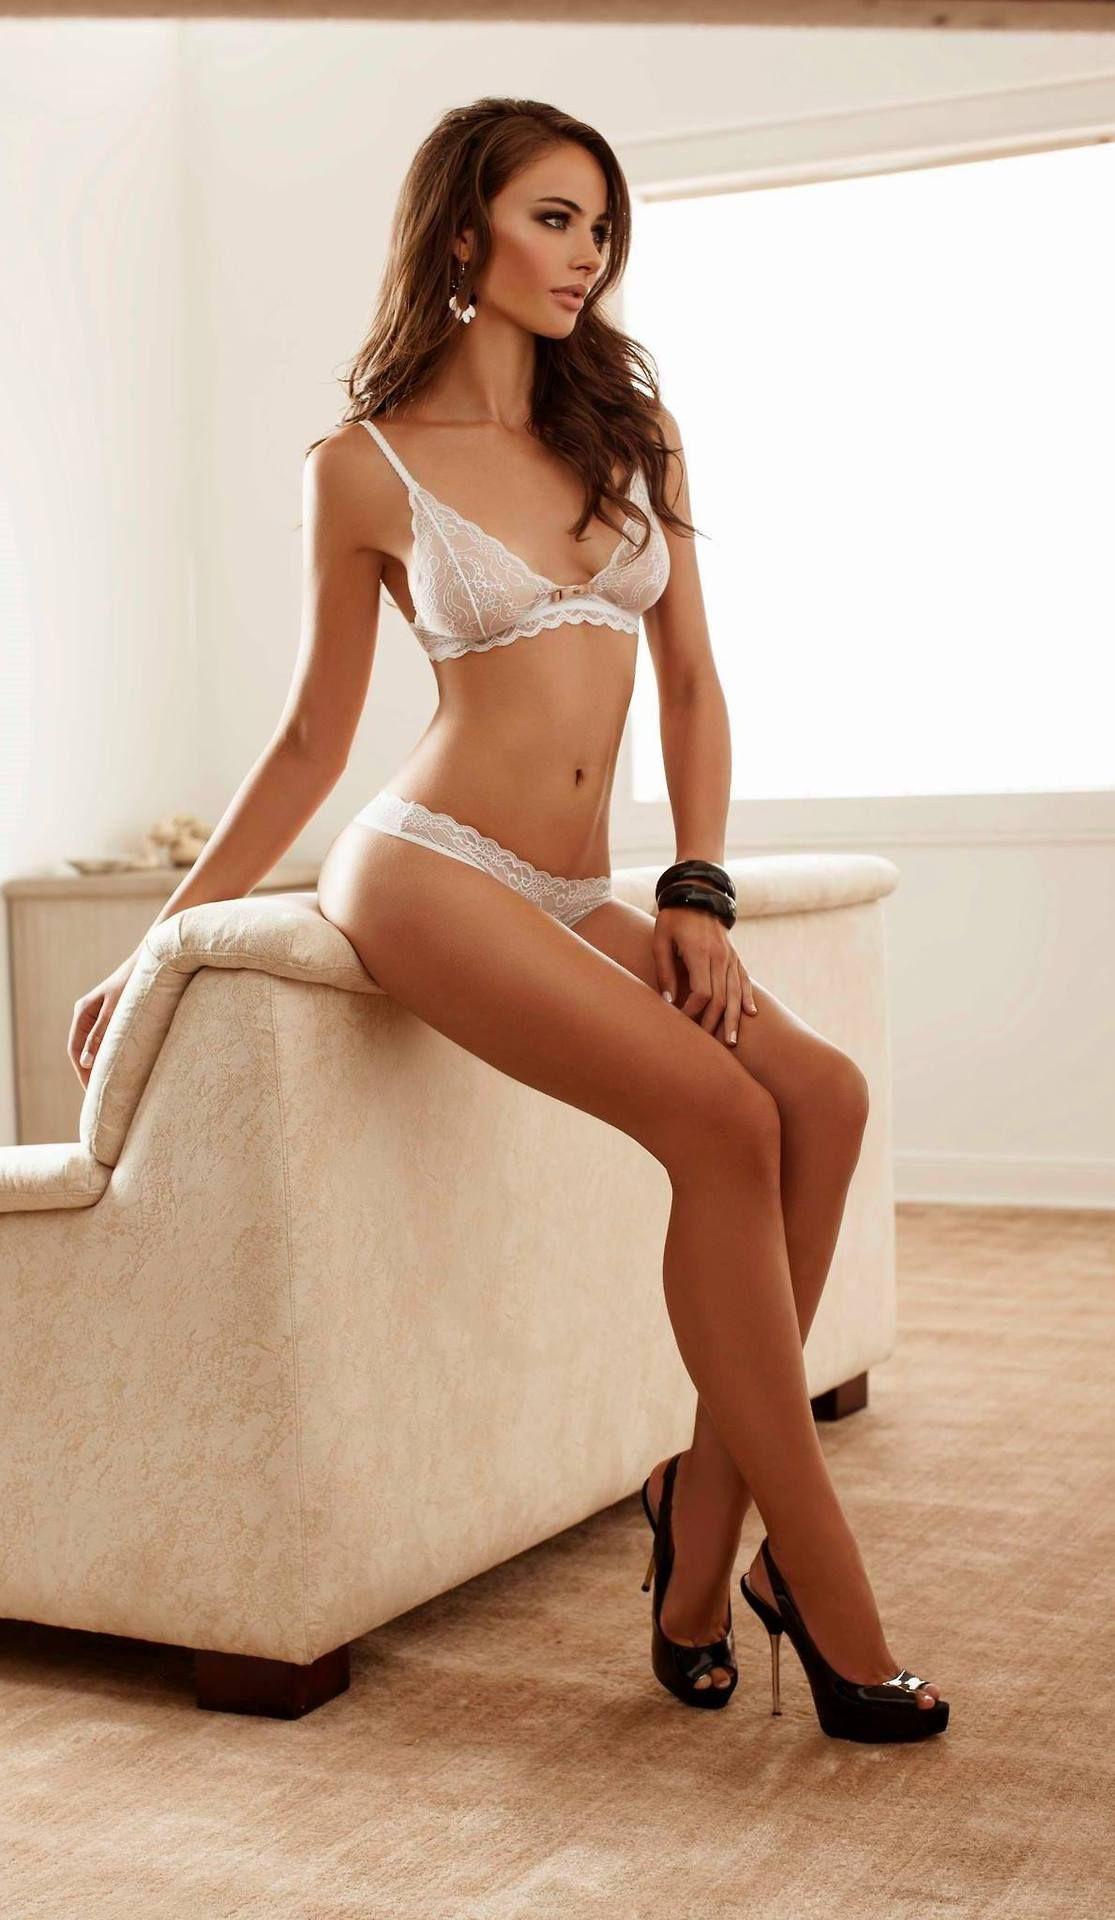 sexy model in heels! beautiful body, nice long legs! calendars of